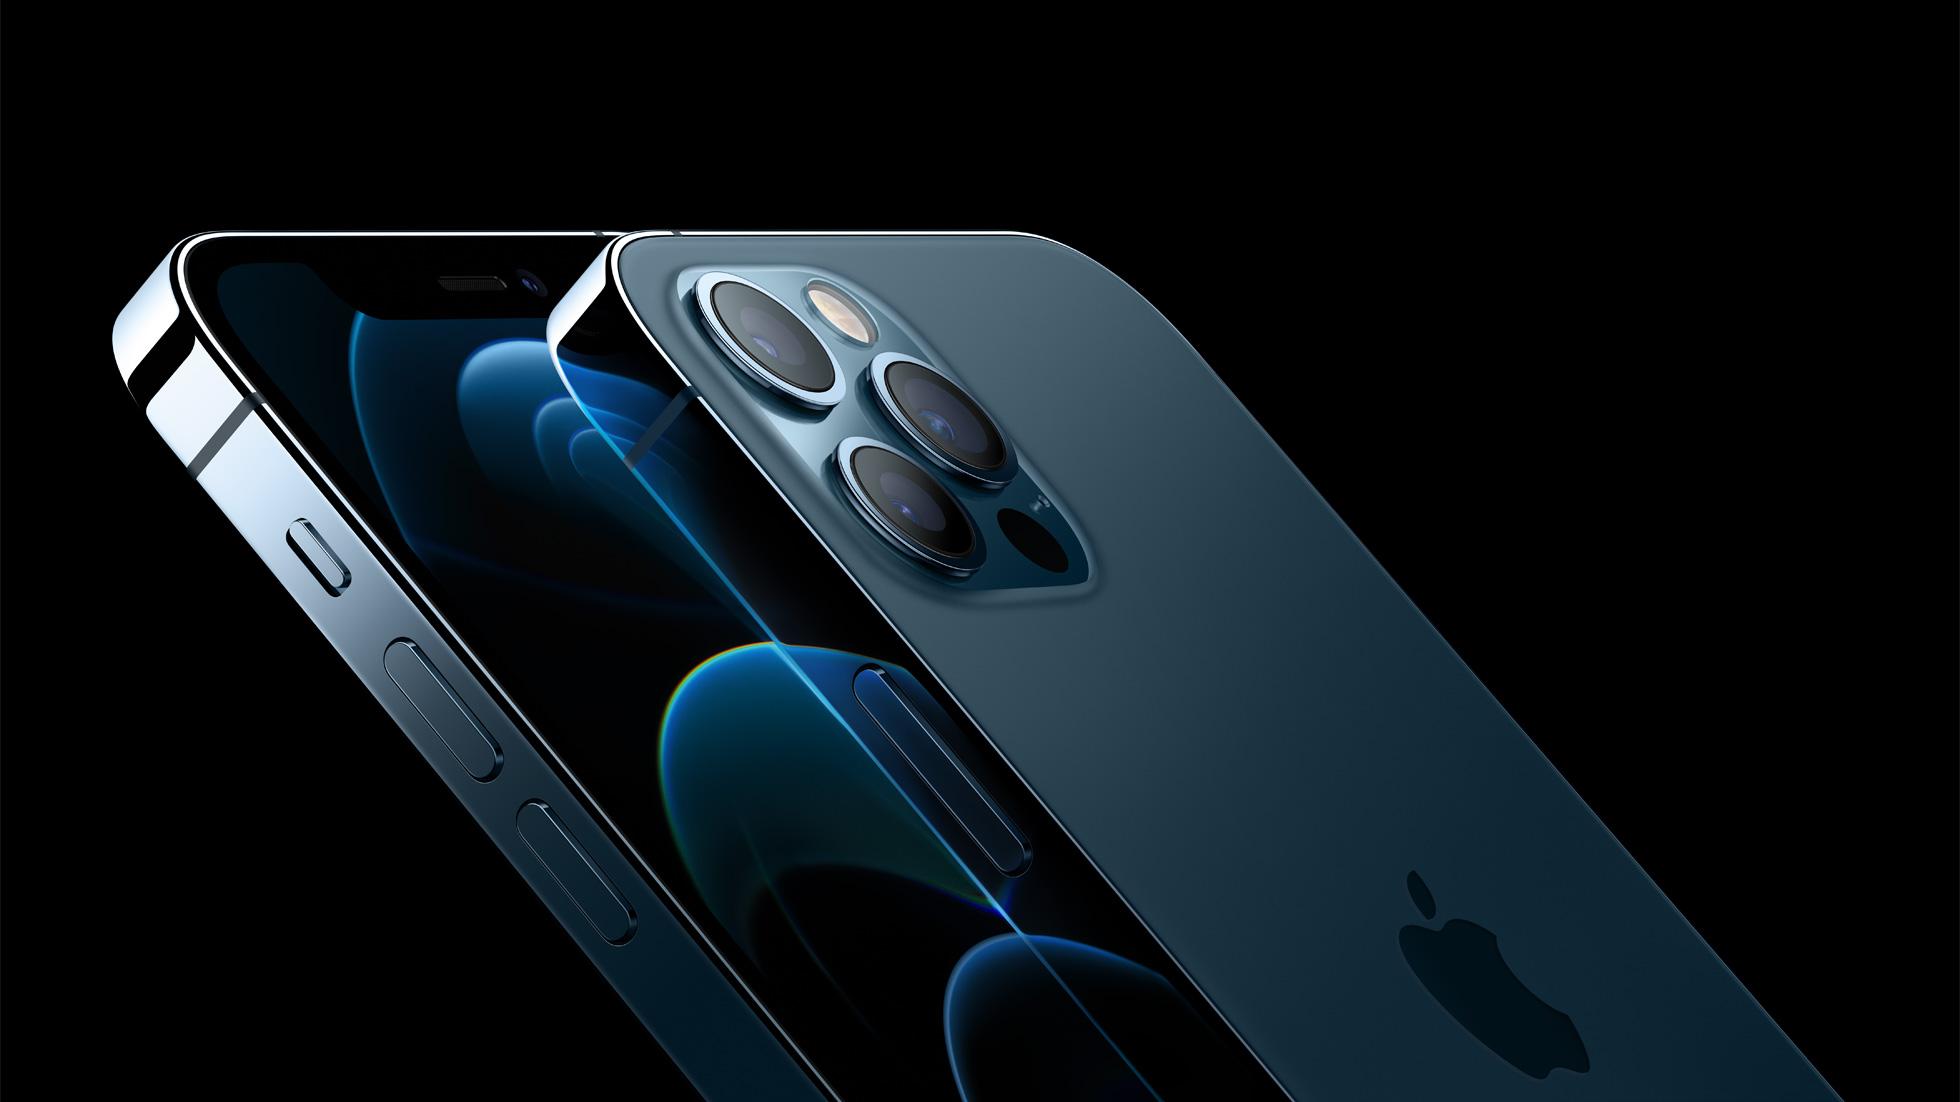 Apple_announce-iphone12pro_10132020_big.jpg.large_2x.jpg